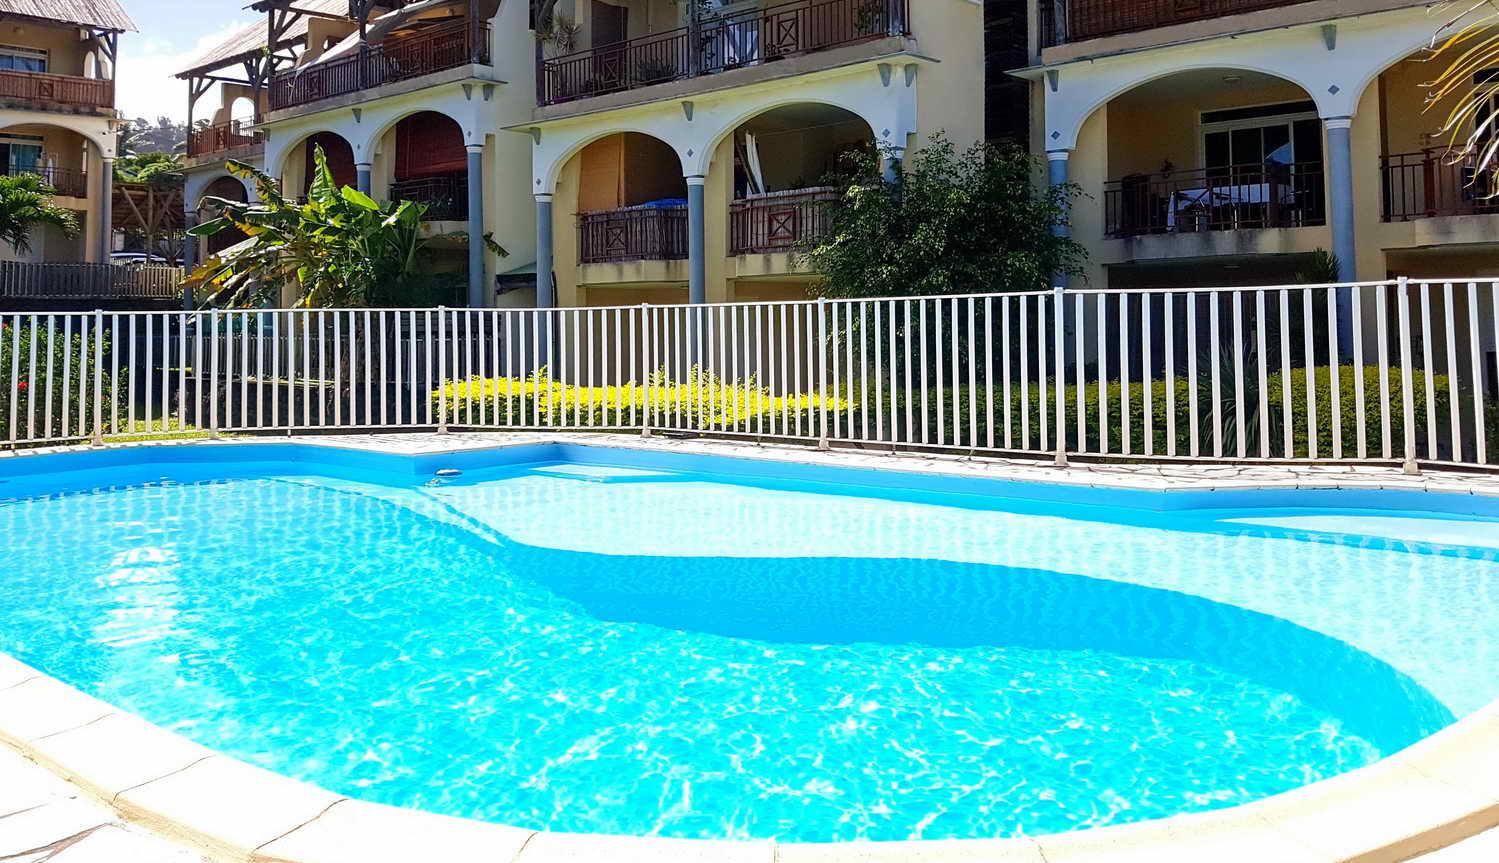 Résidence et sa piscine